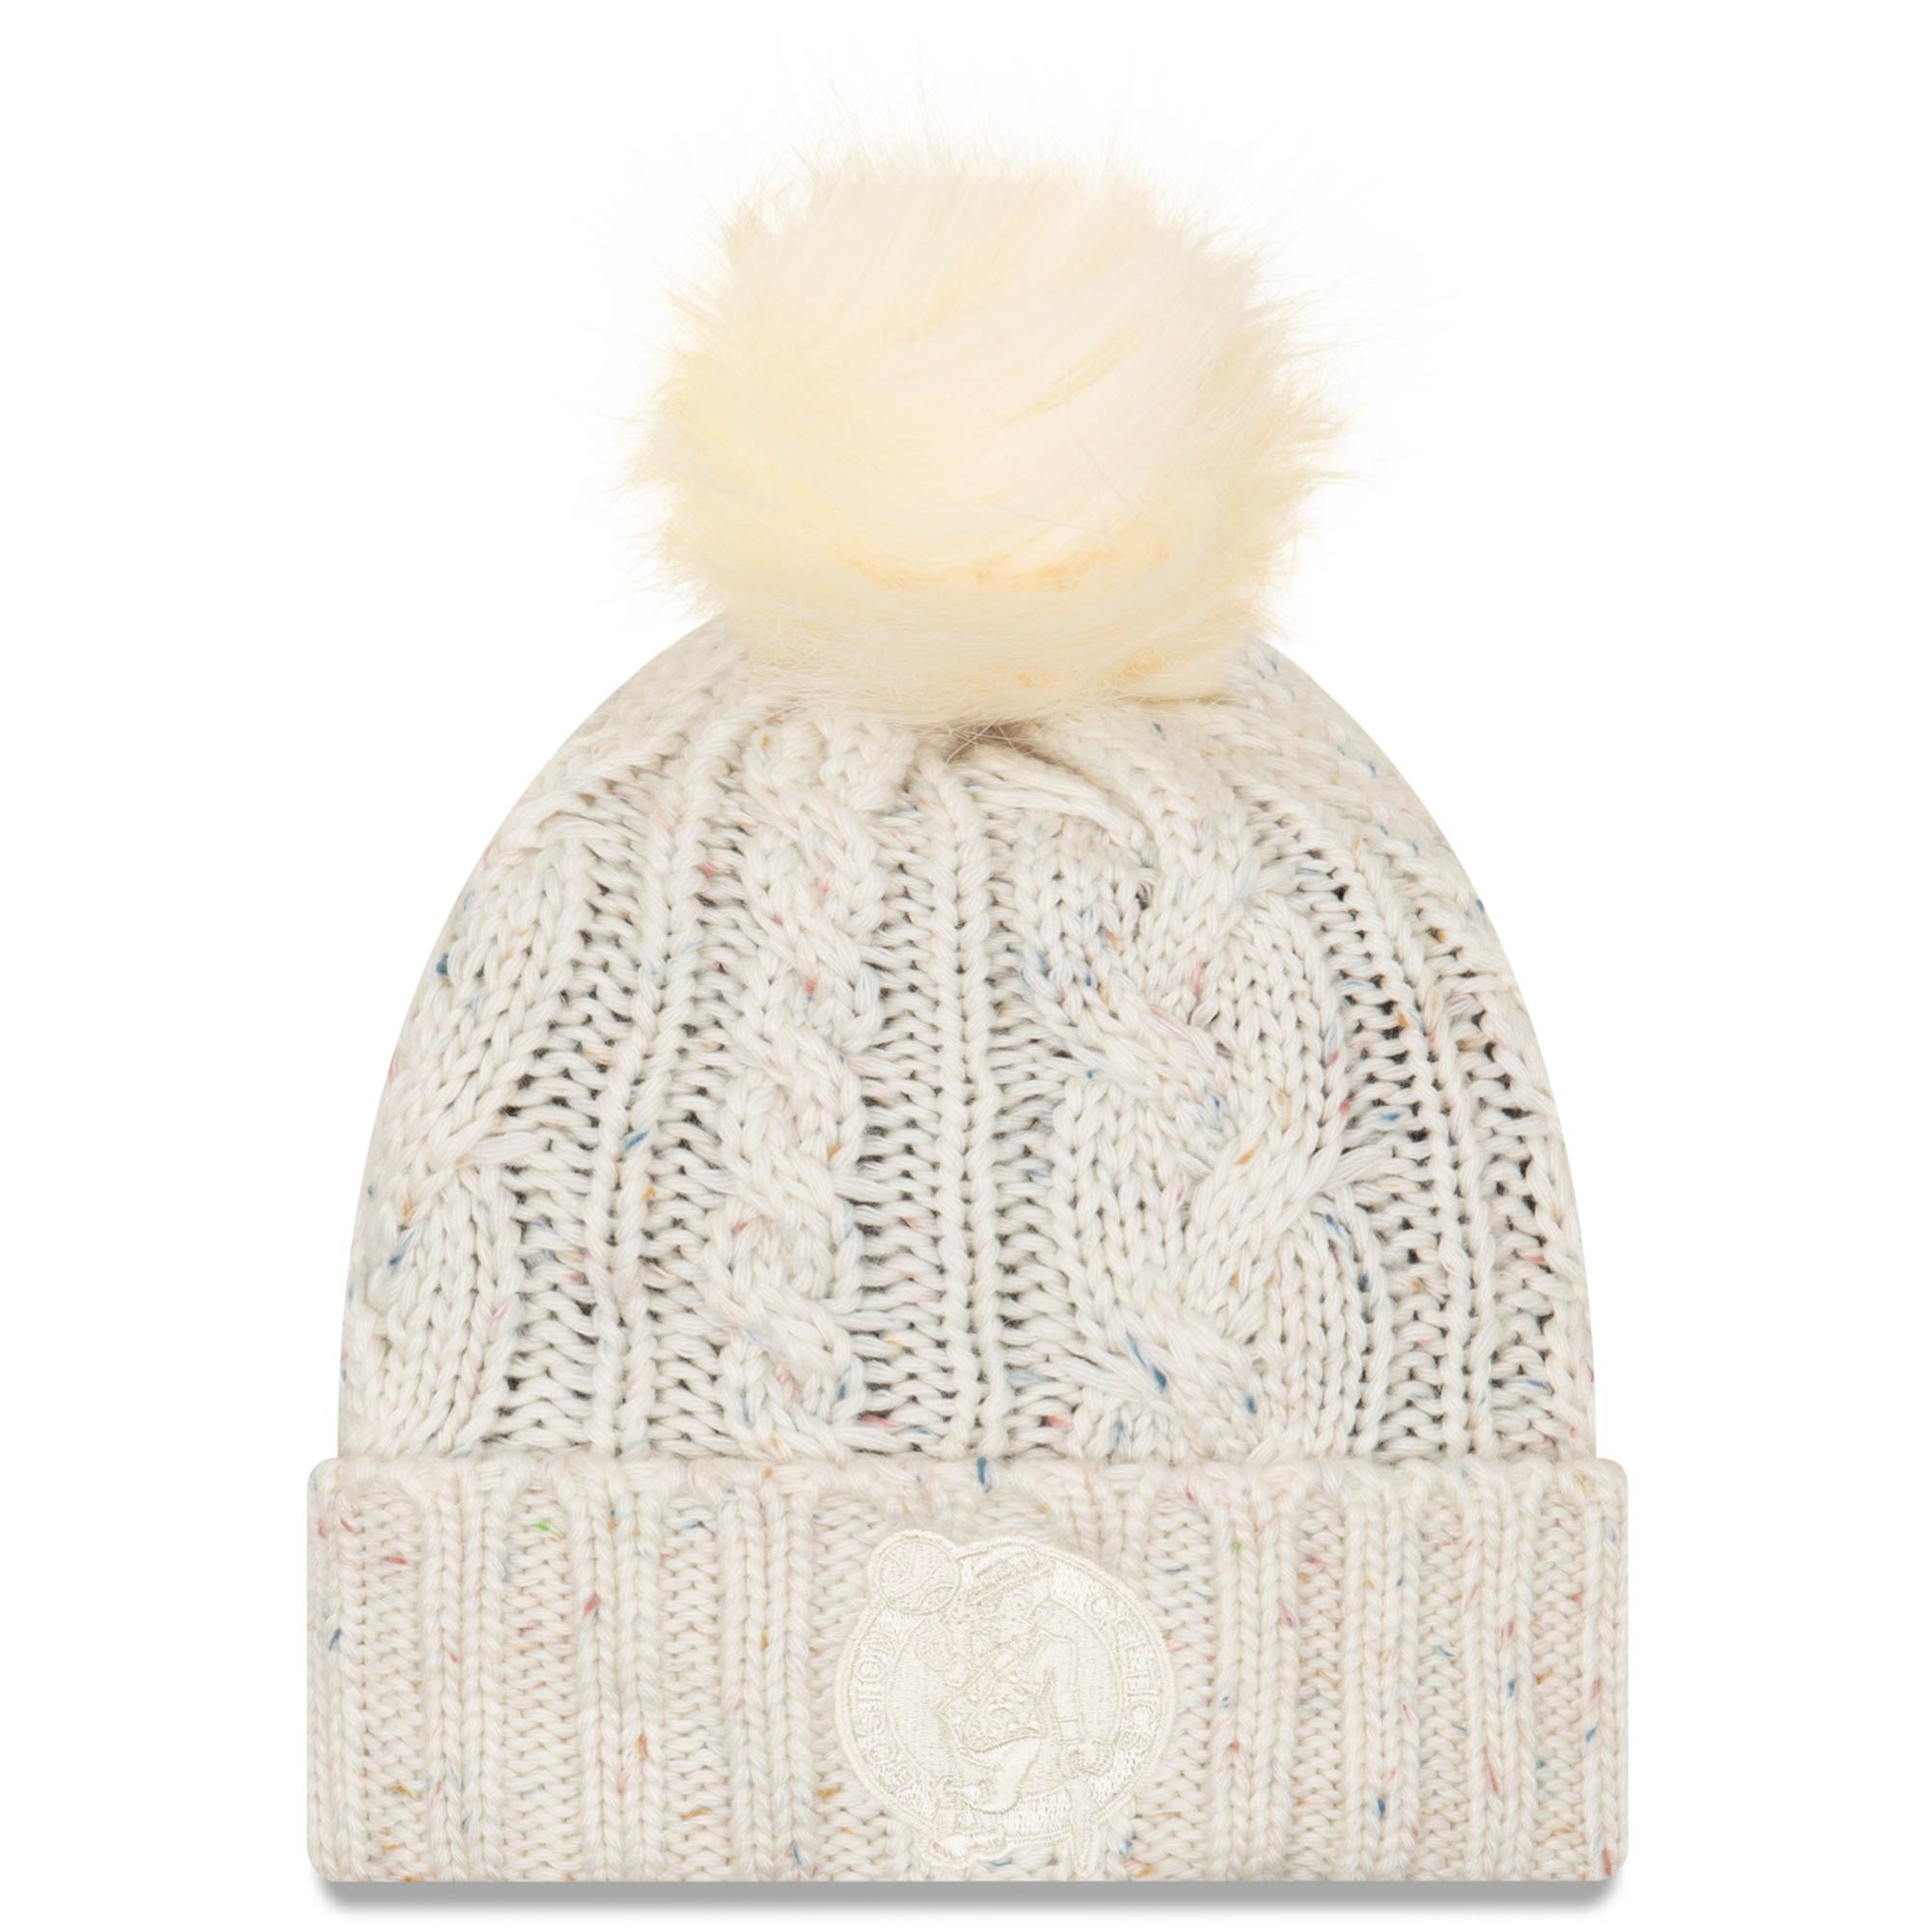 pretty cheap wide varieties retail prices Boston Celtics New Era Women's Fuzzy Cuffed Knit Hat with Pom ...